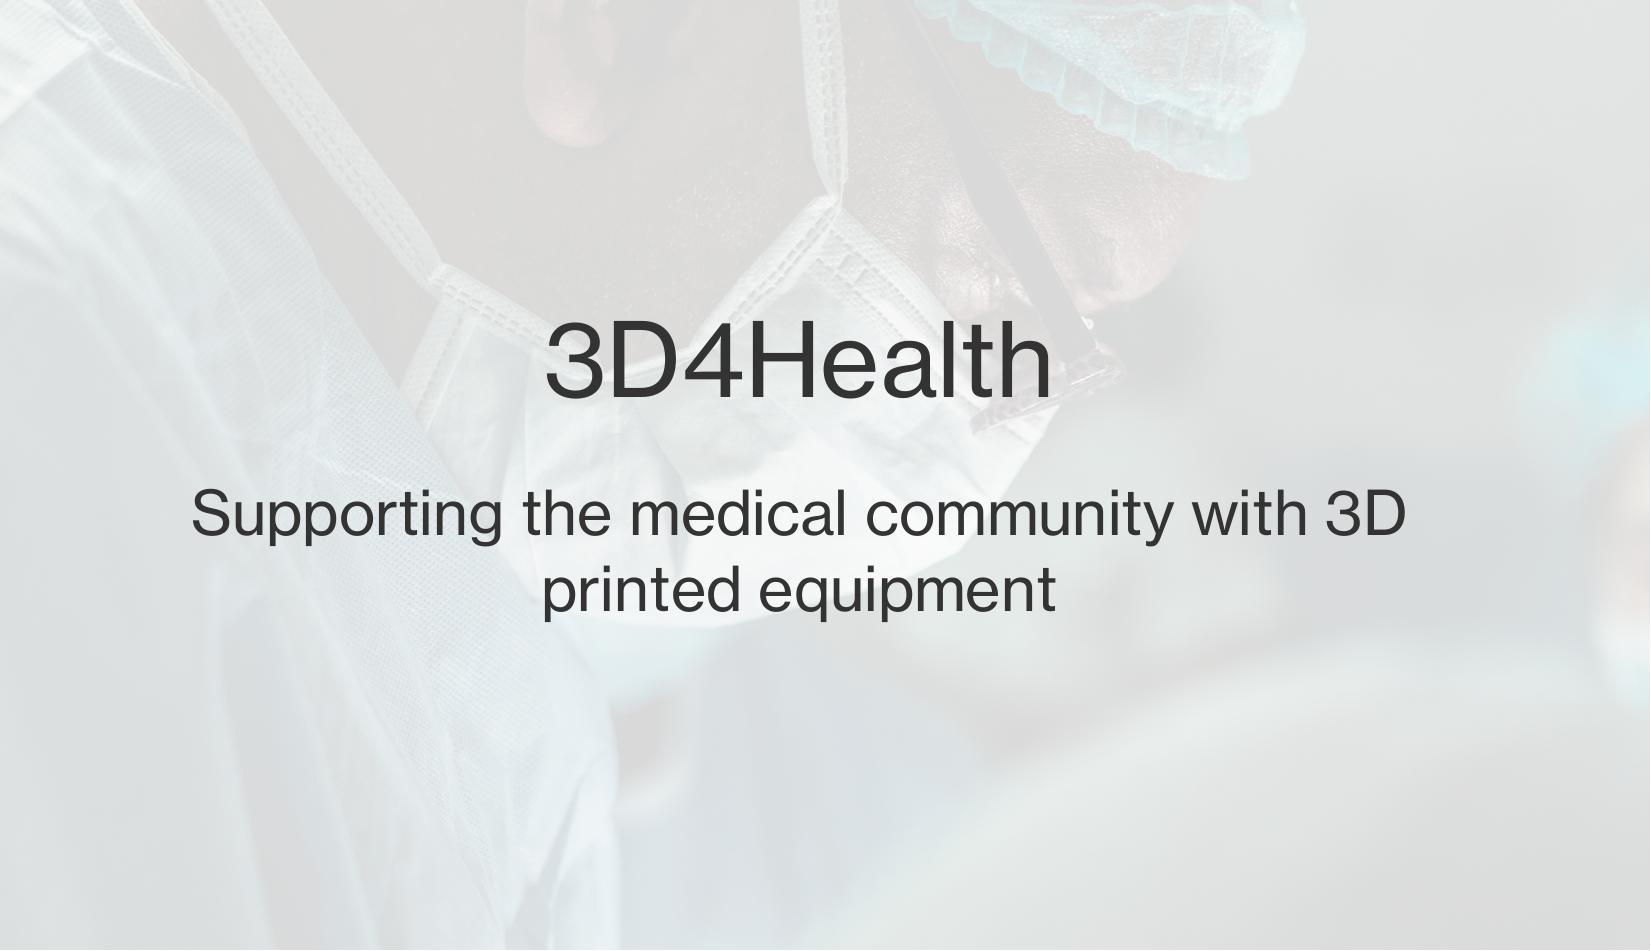 3D4Health